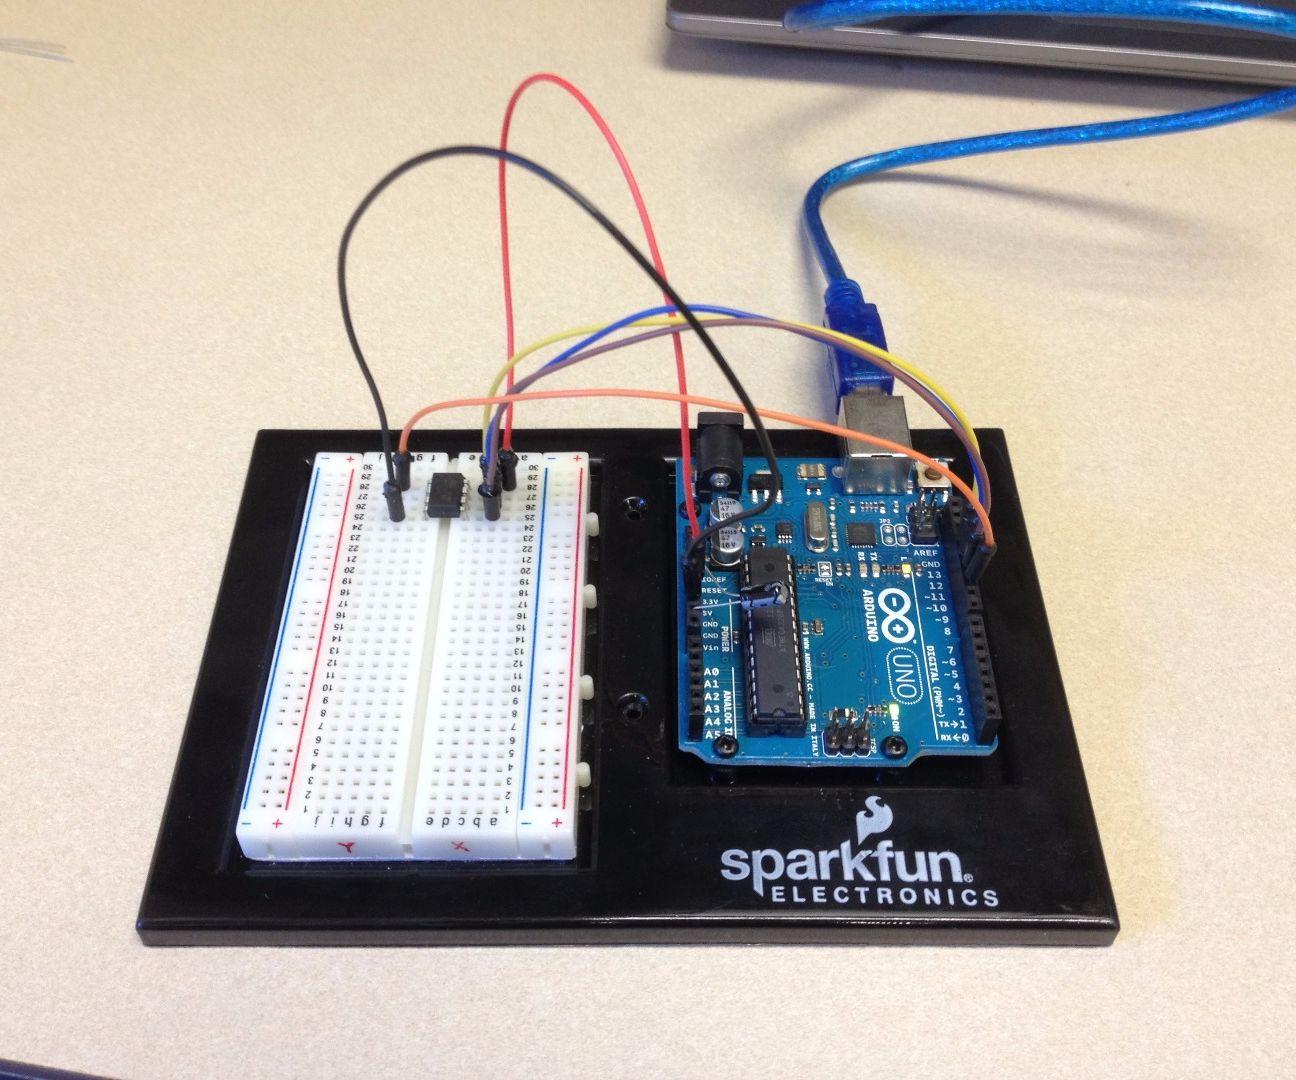 Program an ATtiny44/45/84/85 with Arduino